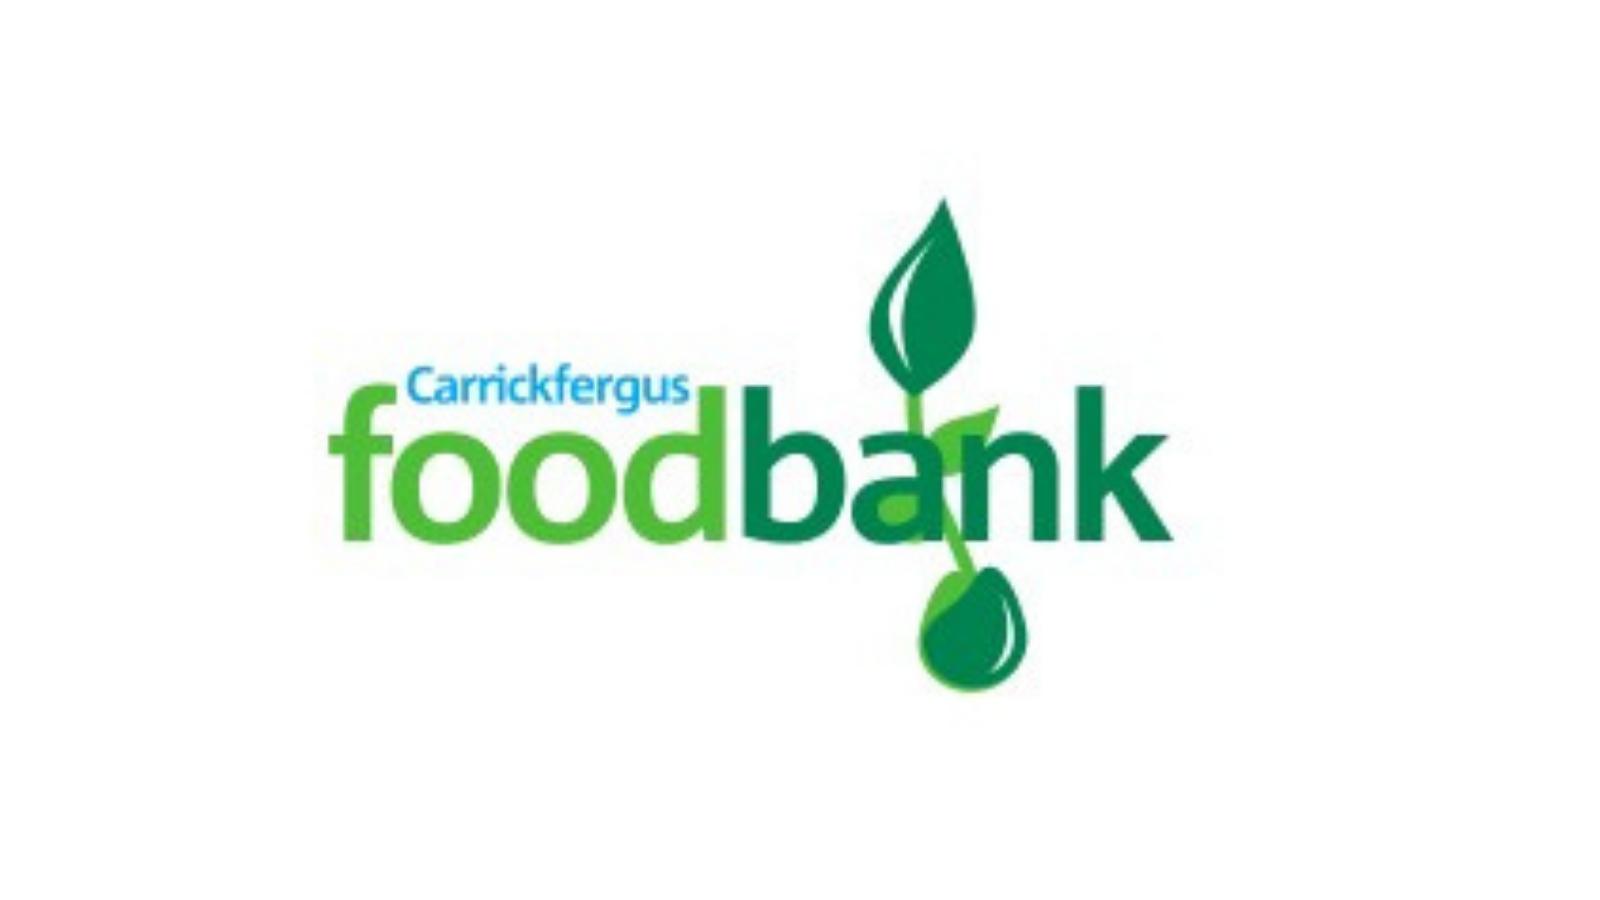 Carrickfergus Foodbank